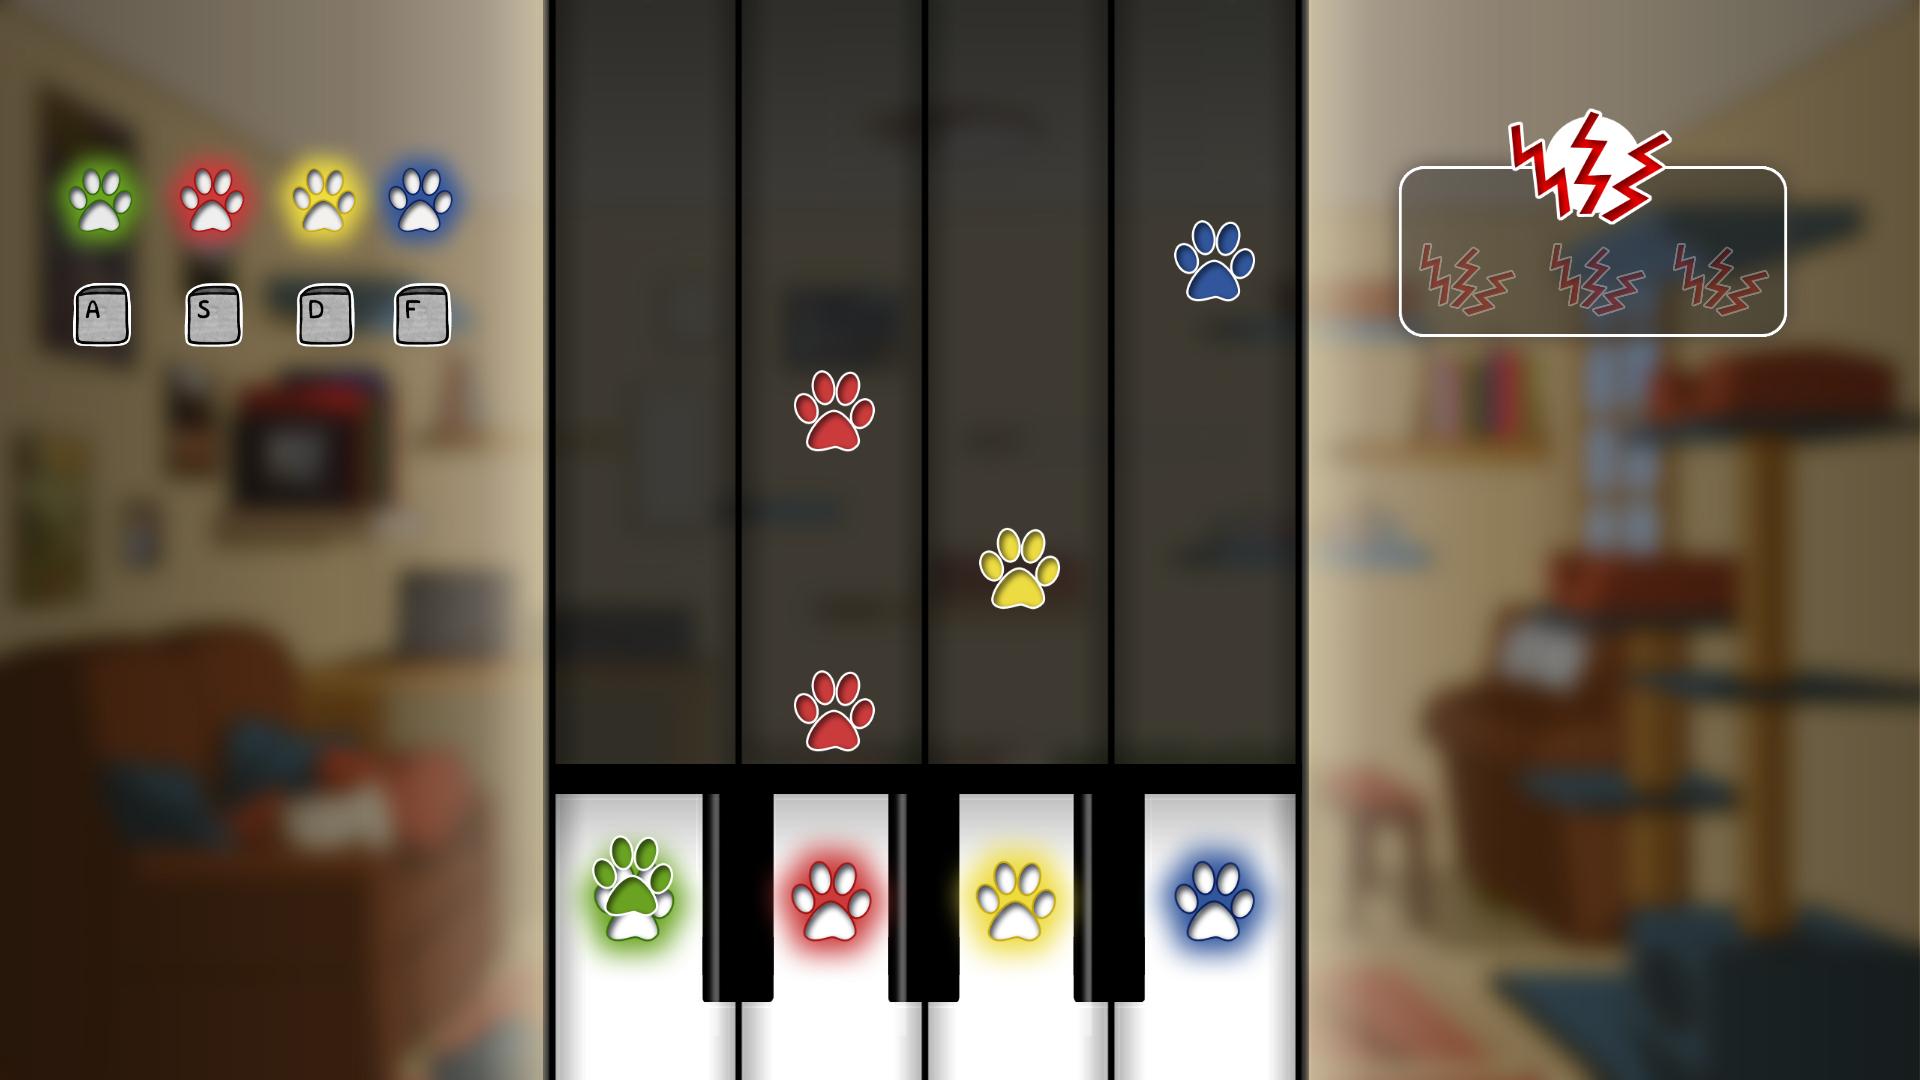 piano mini game